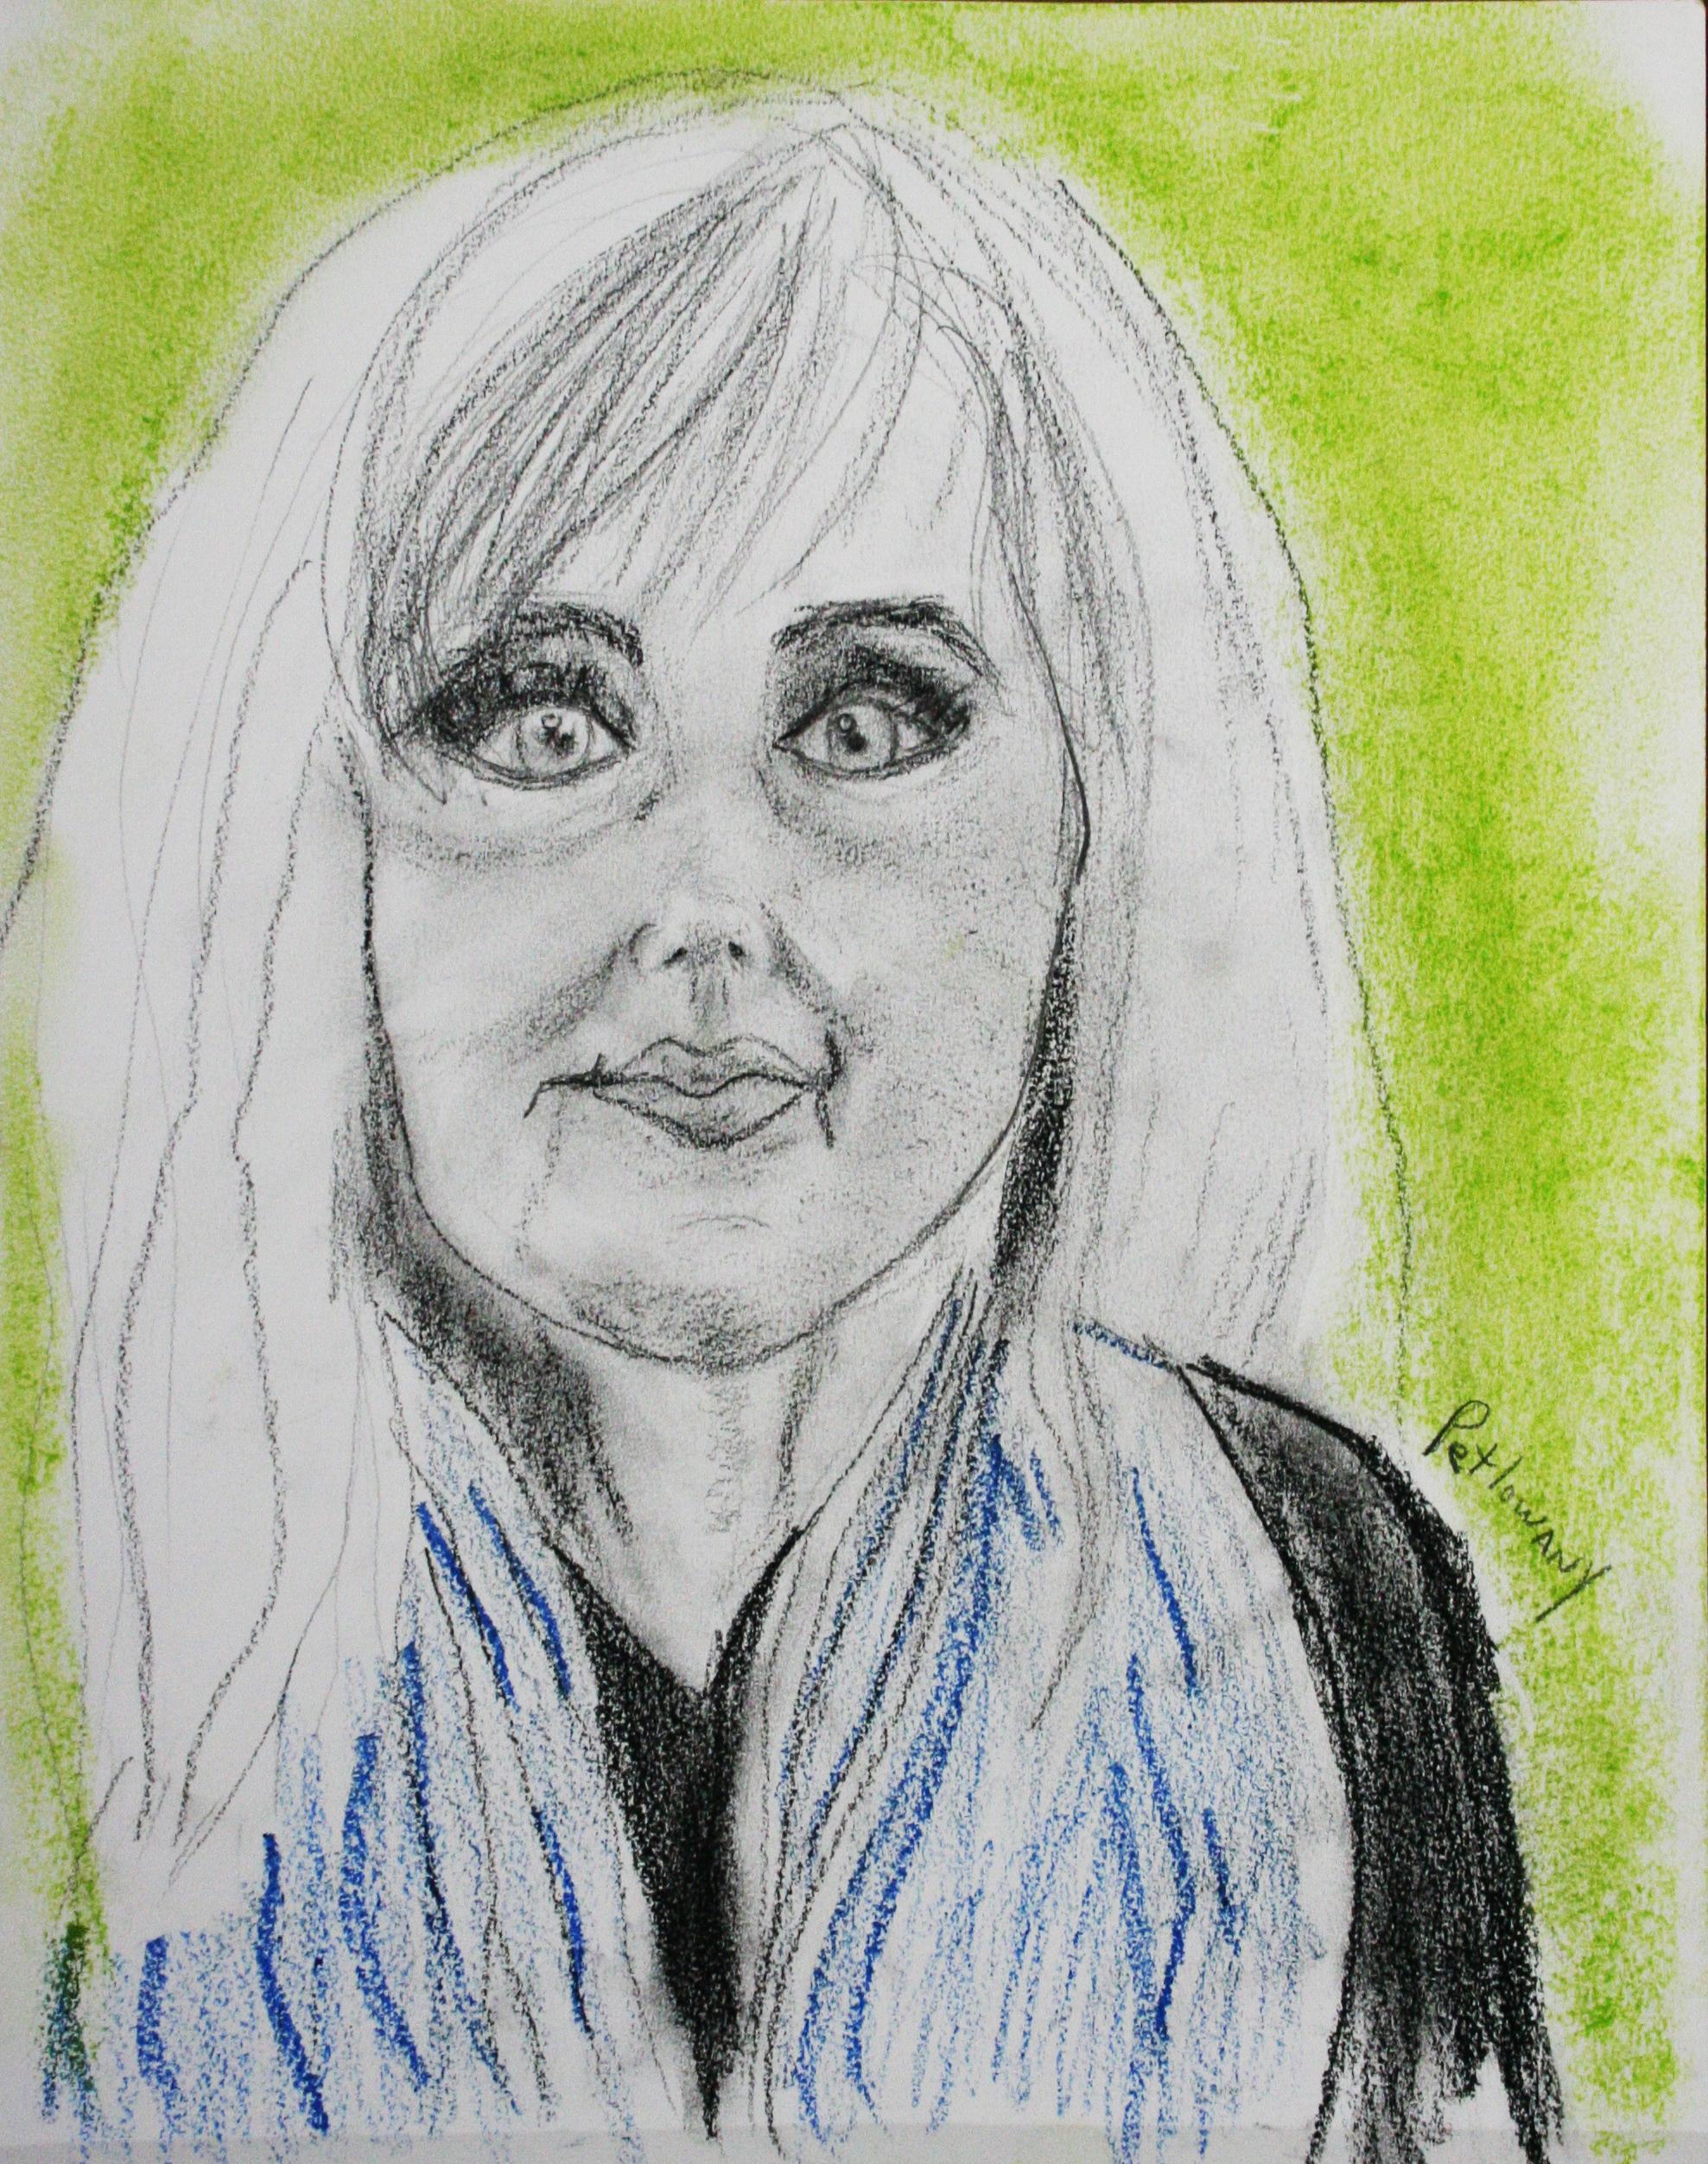 Paula Petlowany did this two and a half hour pastel drawing.